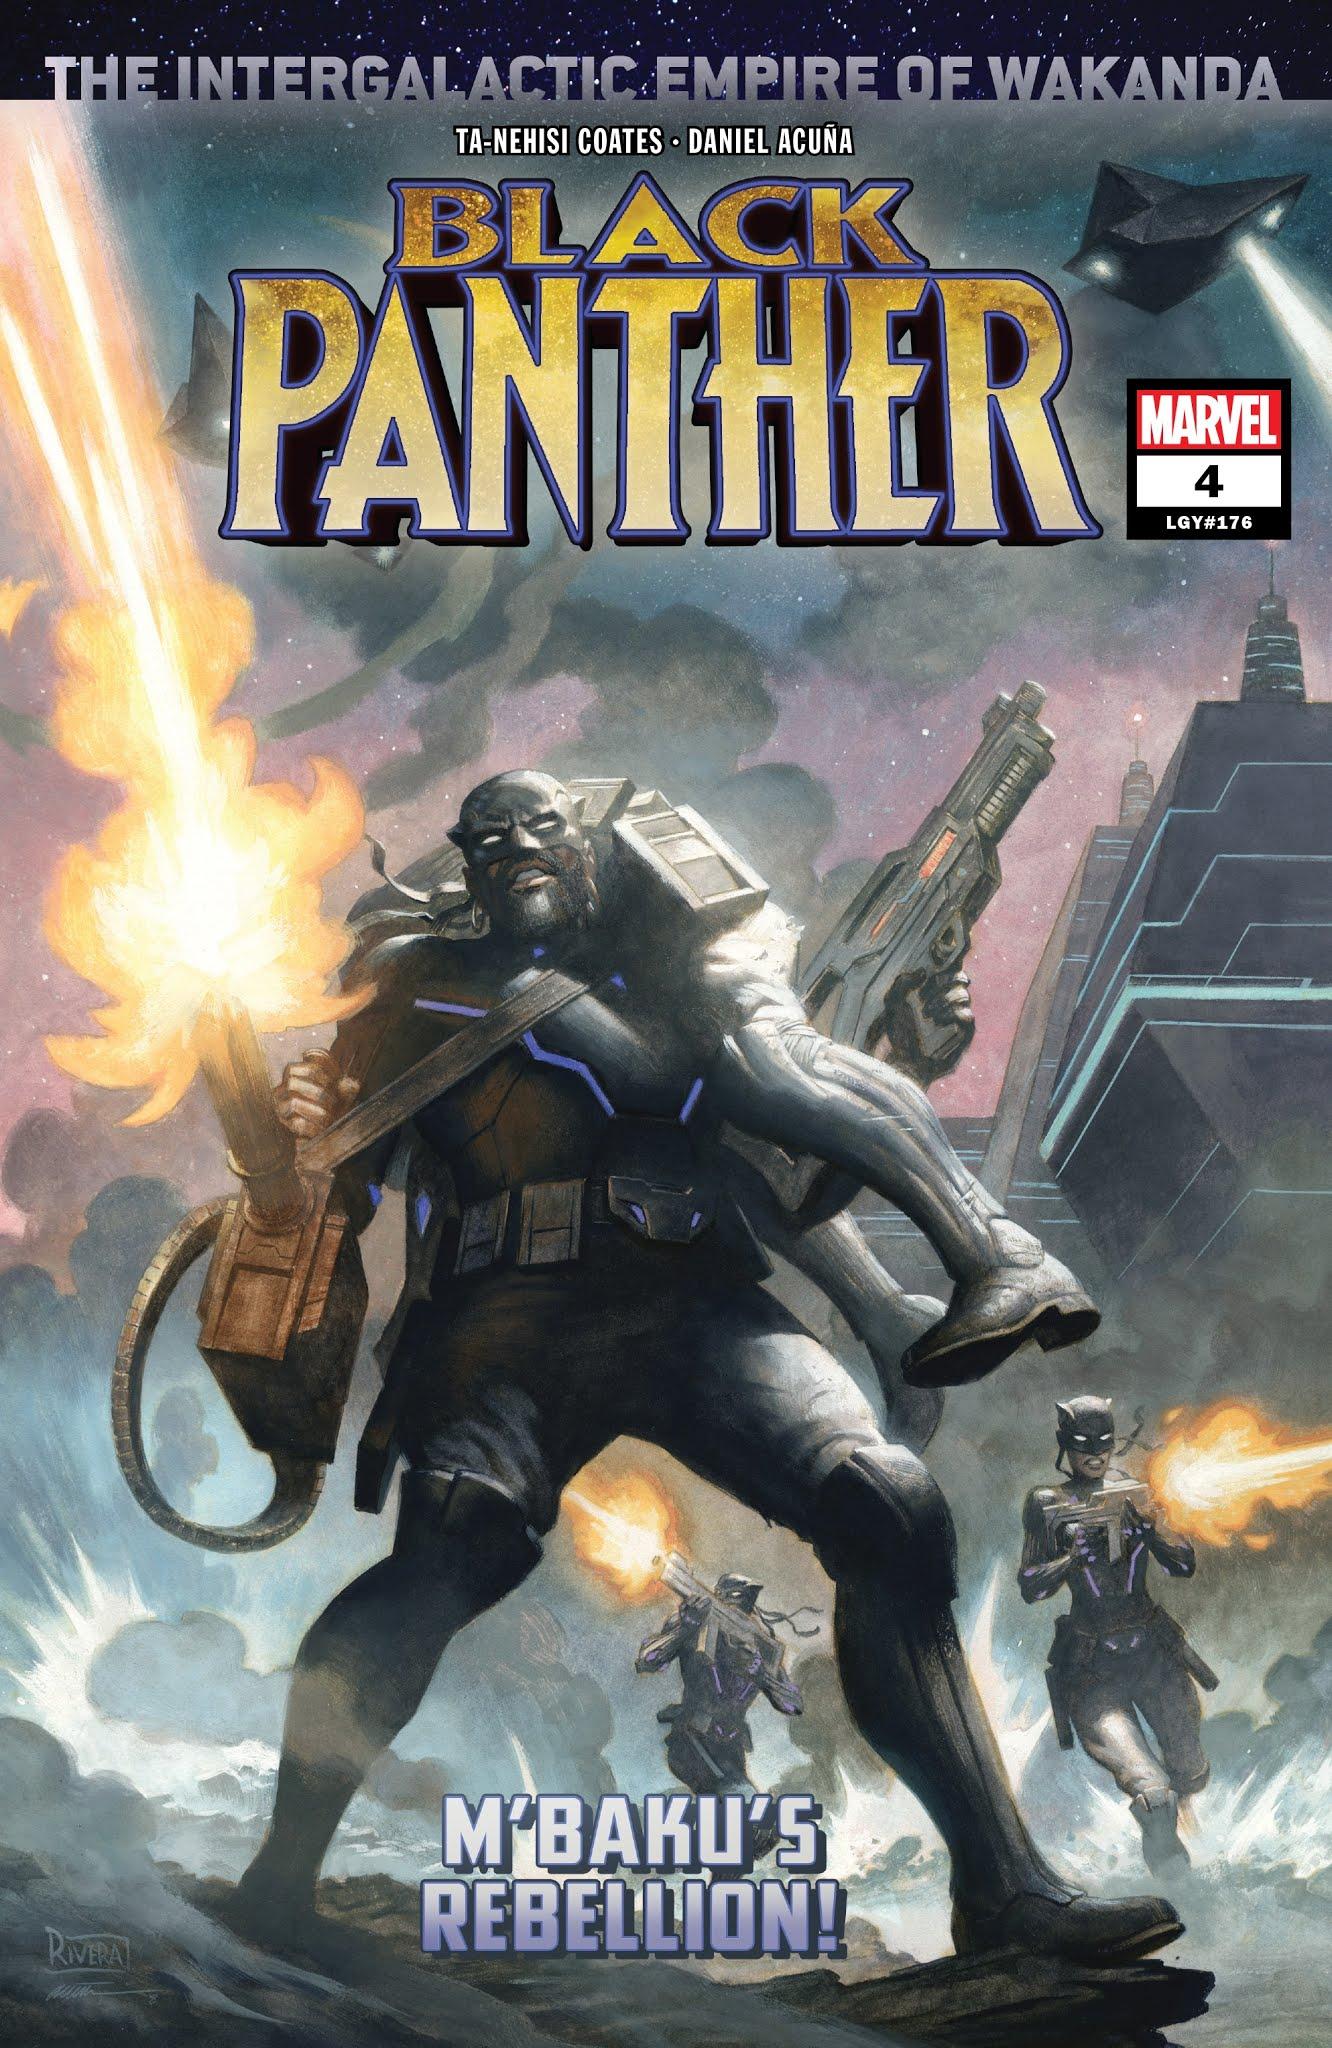 Black Panther (2018) 4 Page 1